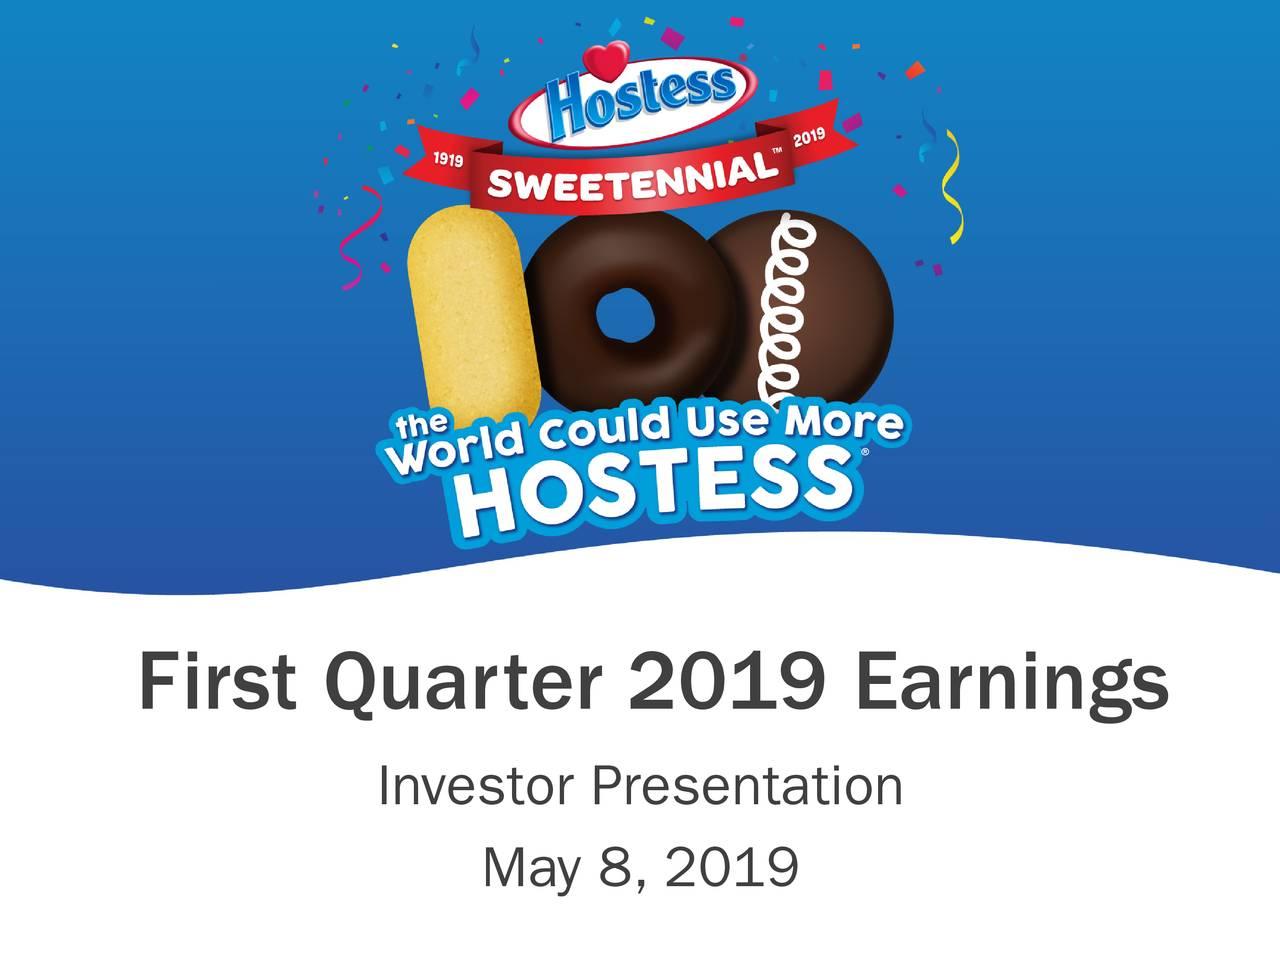 First Quarter 2019 Earnings Investor Presentation May 8, 2019